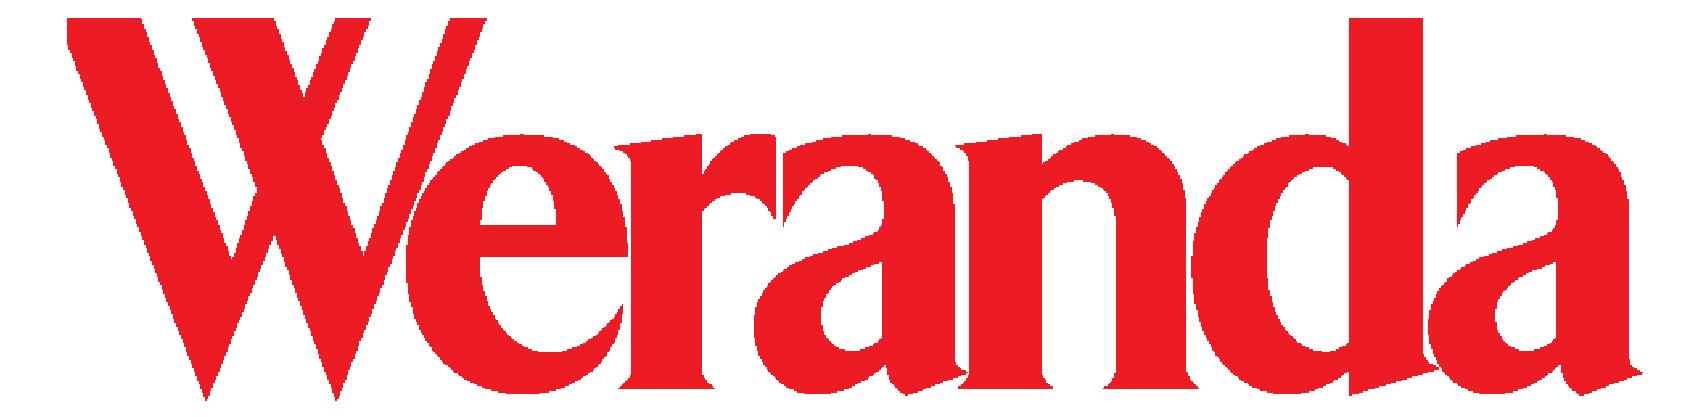 Weranda